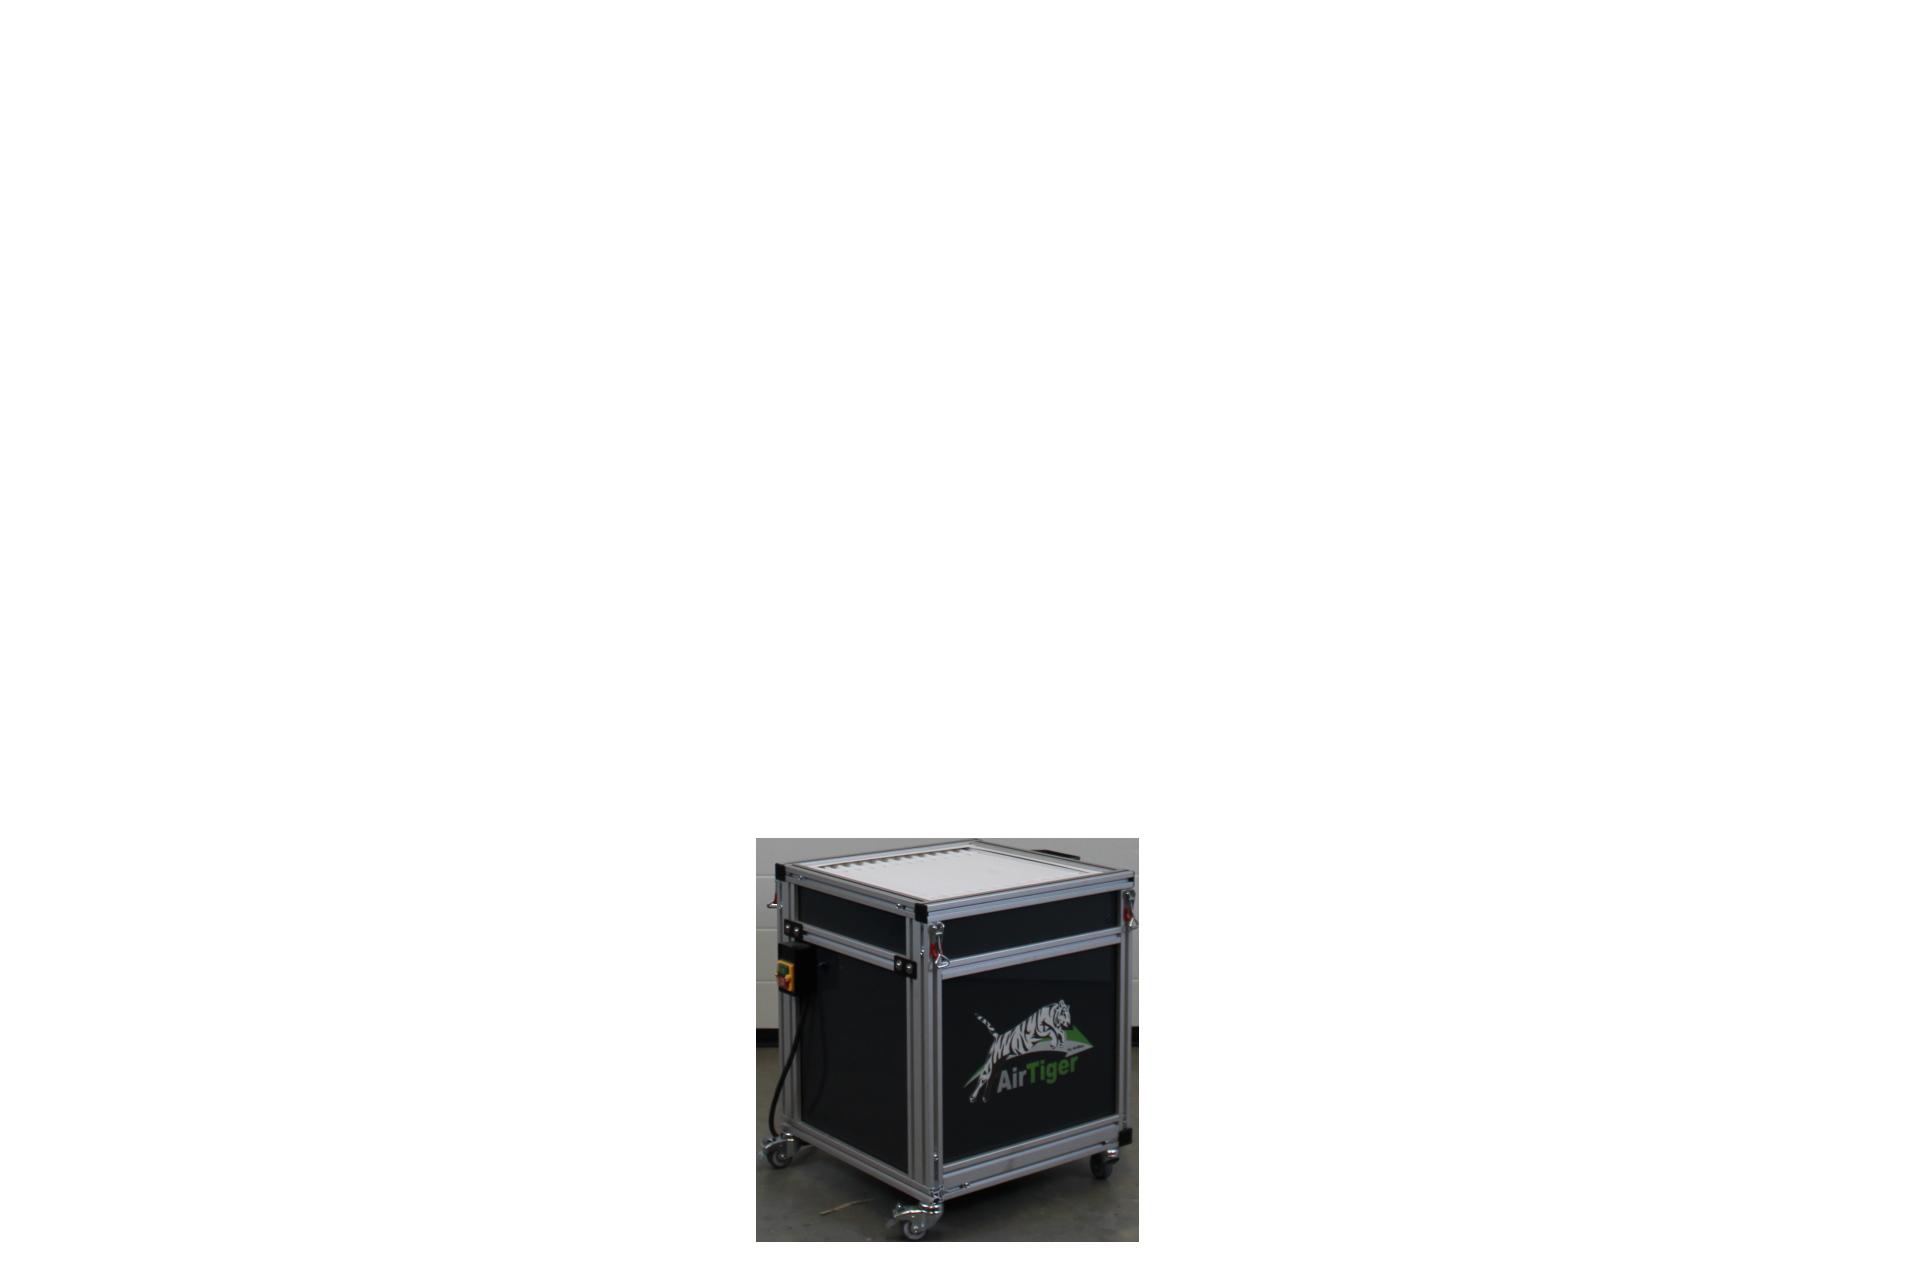 AirTiger Basisgerät